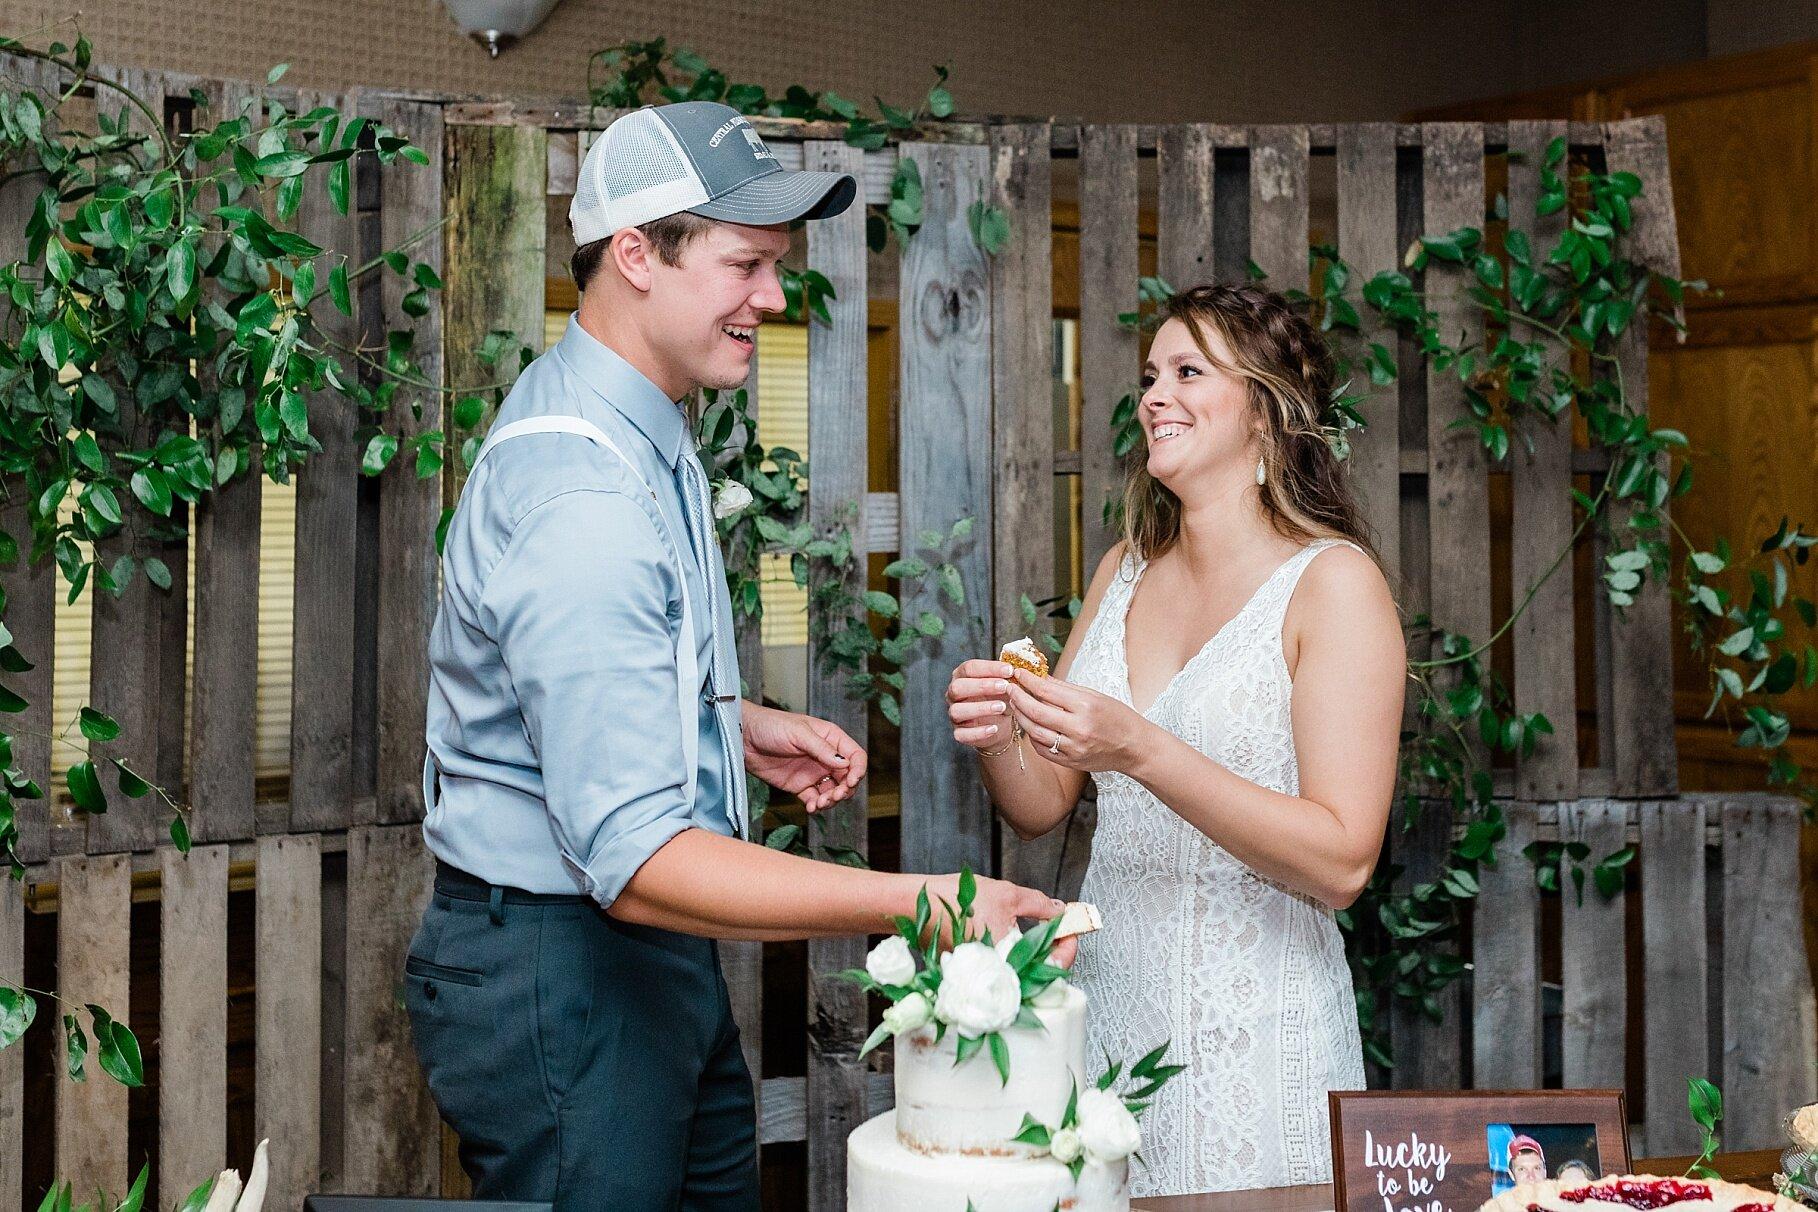 Earth-Toned Wedding by KKP Associate Wedding Photographer and Kelsi Kliethermes Photography Best Columbia Missouri Wedding Photographer_0013.jpg